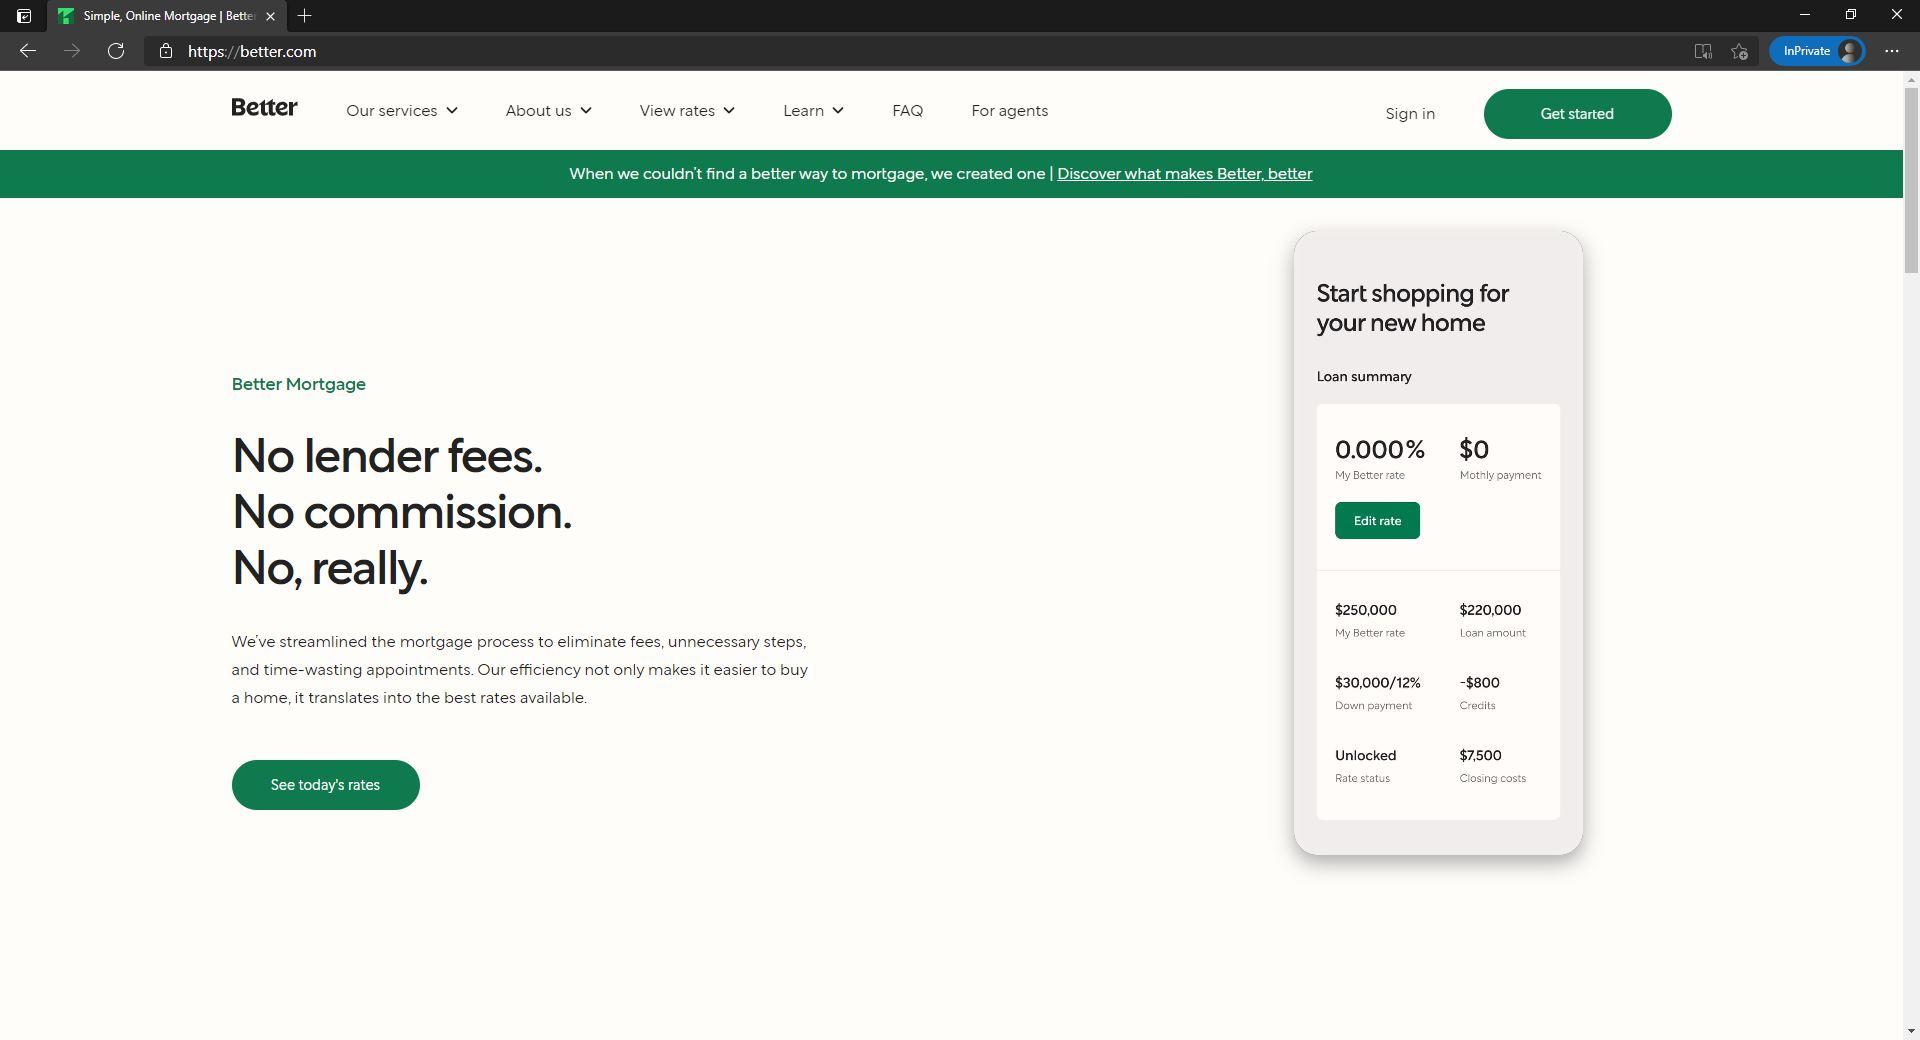 Better website homepage